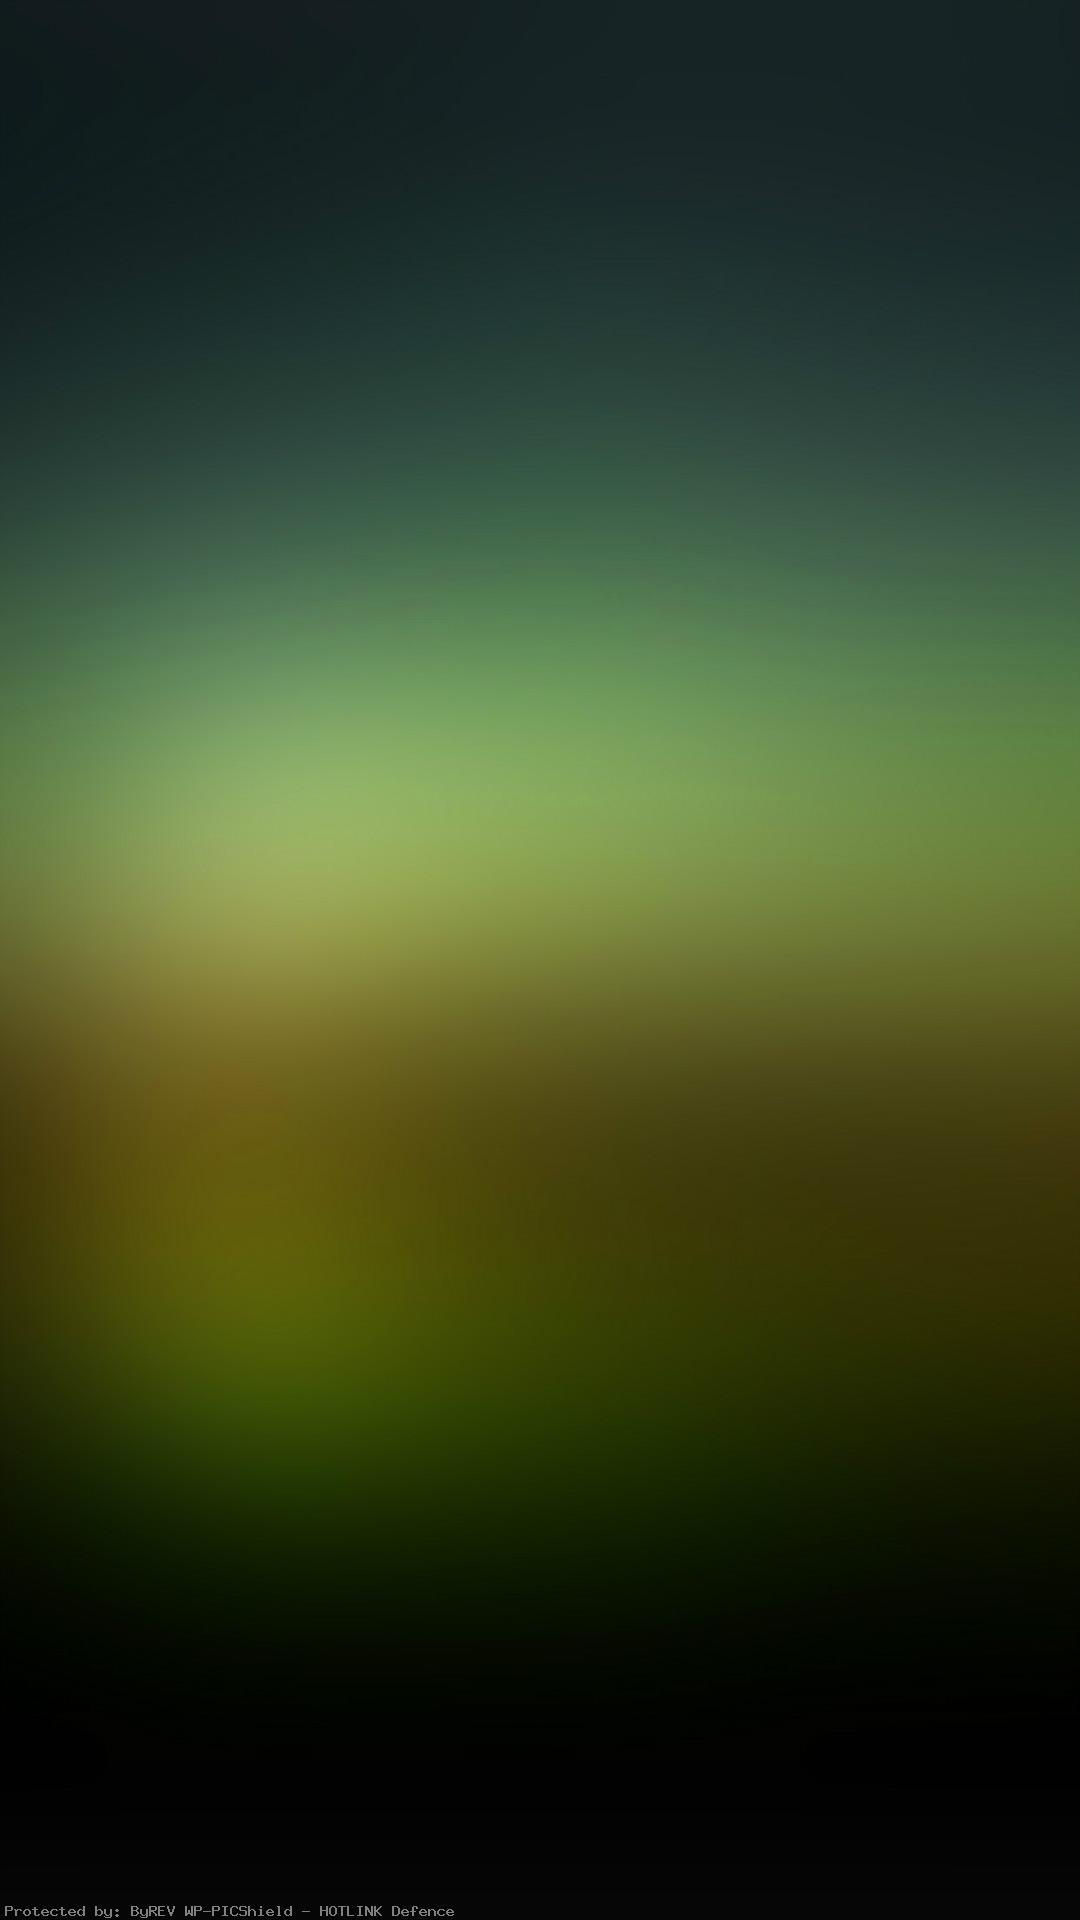 Aurora-Night-Nature-Gradation-Blur-iPhone-wallpaper-wp6002908